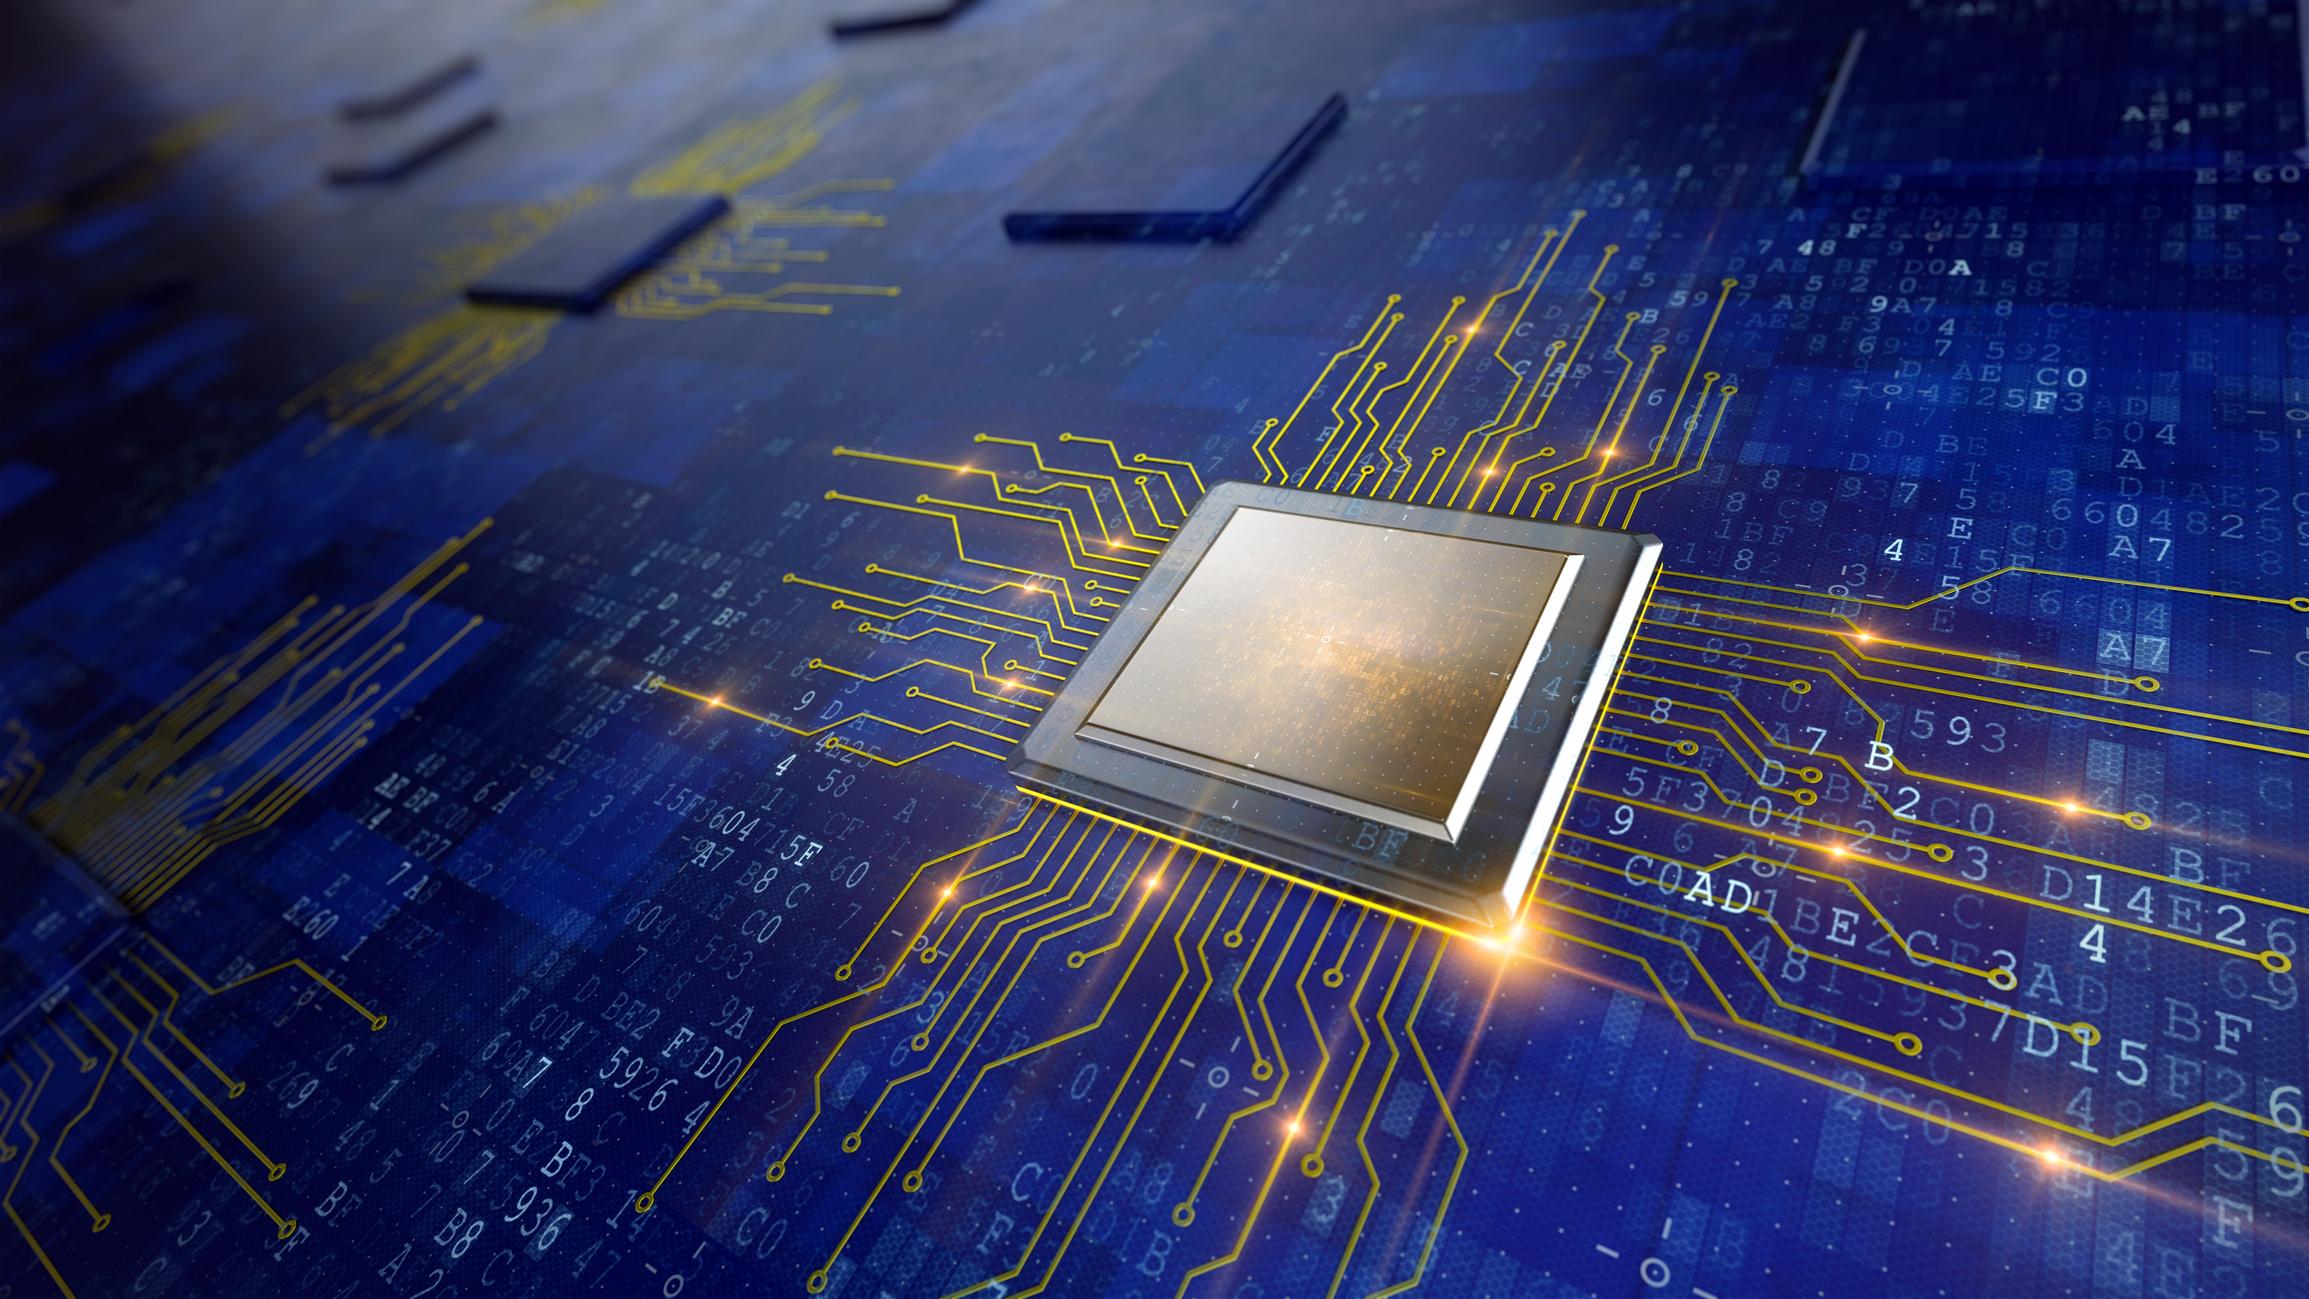 Computer Chip (2018_05_10 12_39_51 UTC)